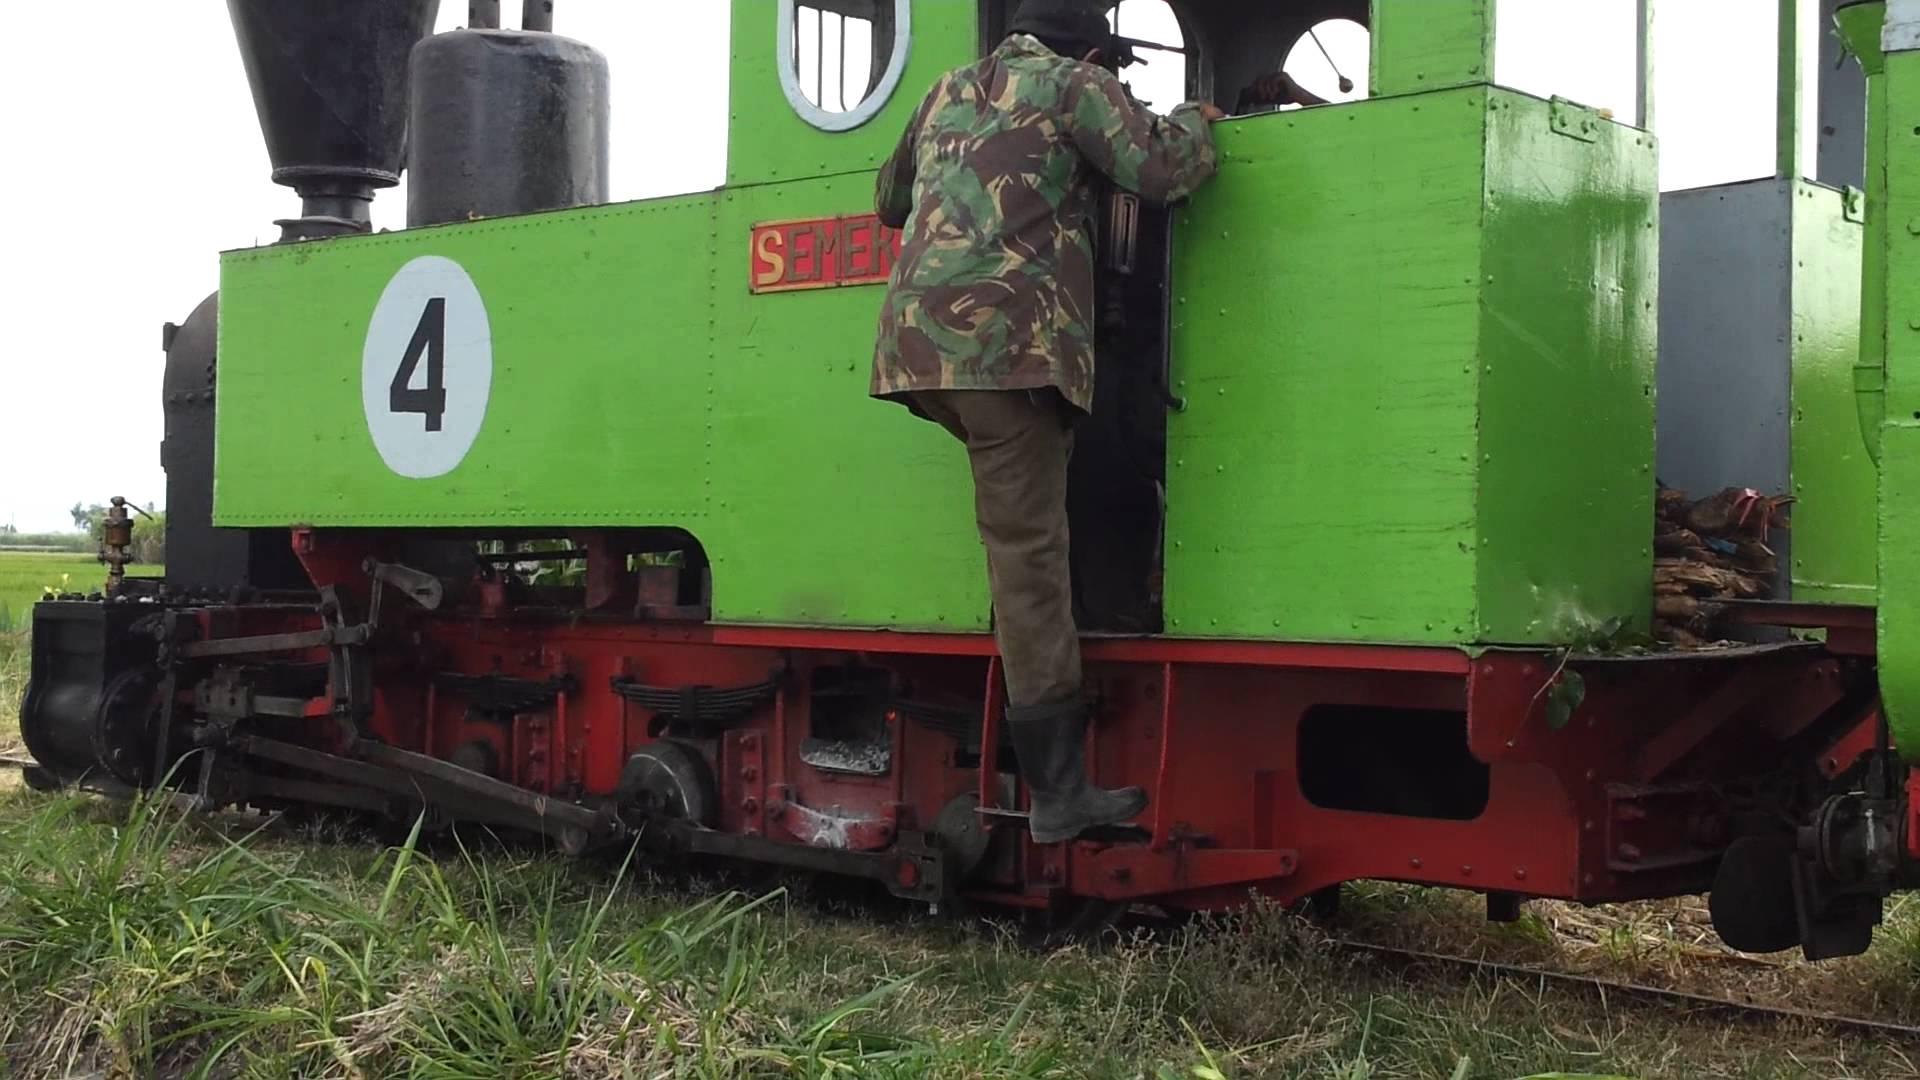 Locomotive Pg Olean Situbondo Part1 Youtube Wisata Pabrik Gula Kab